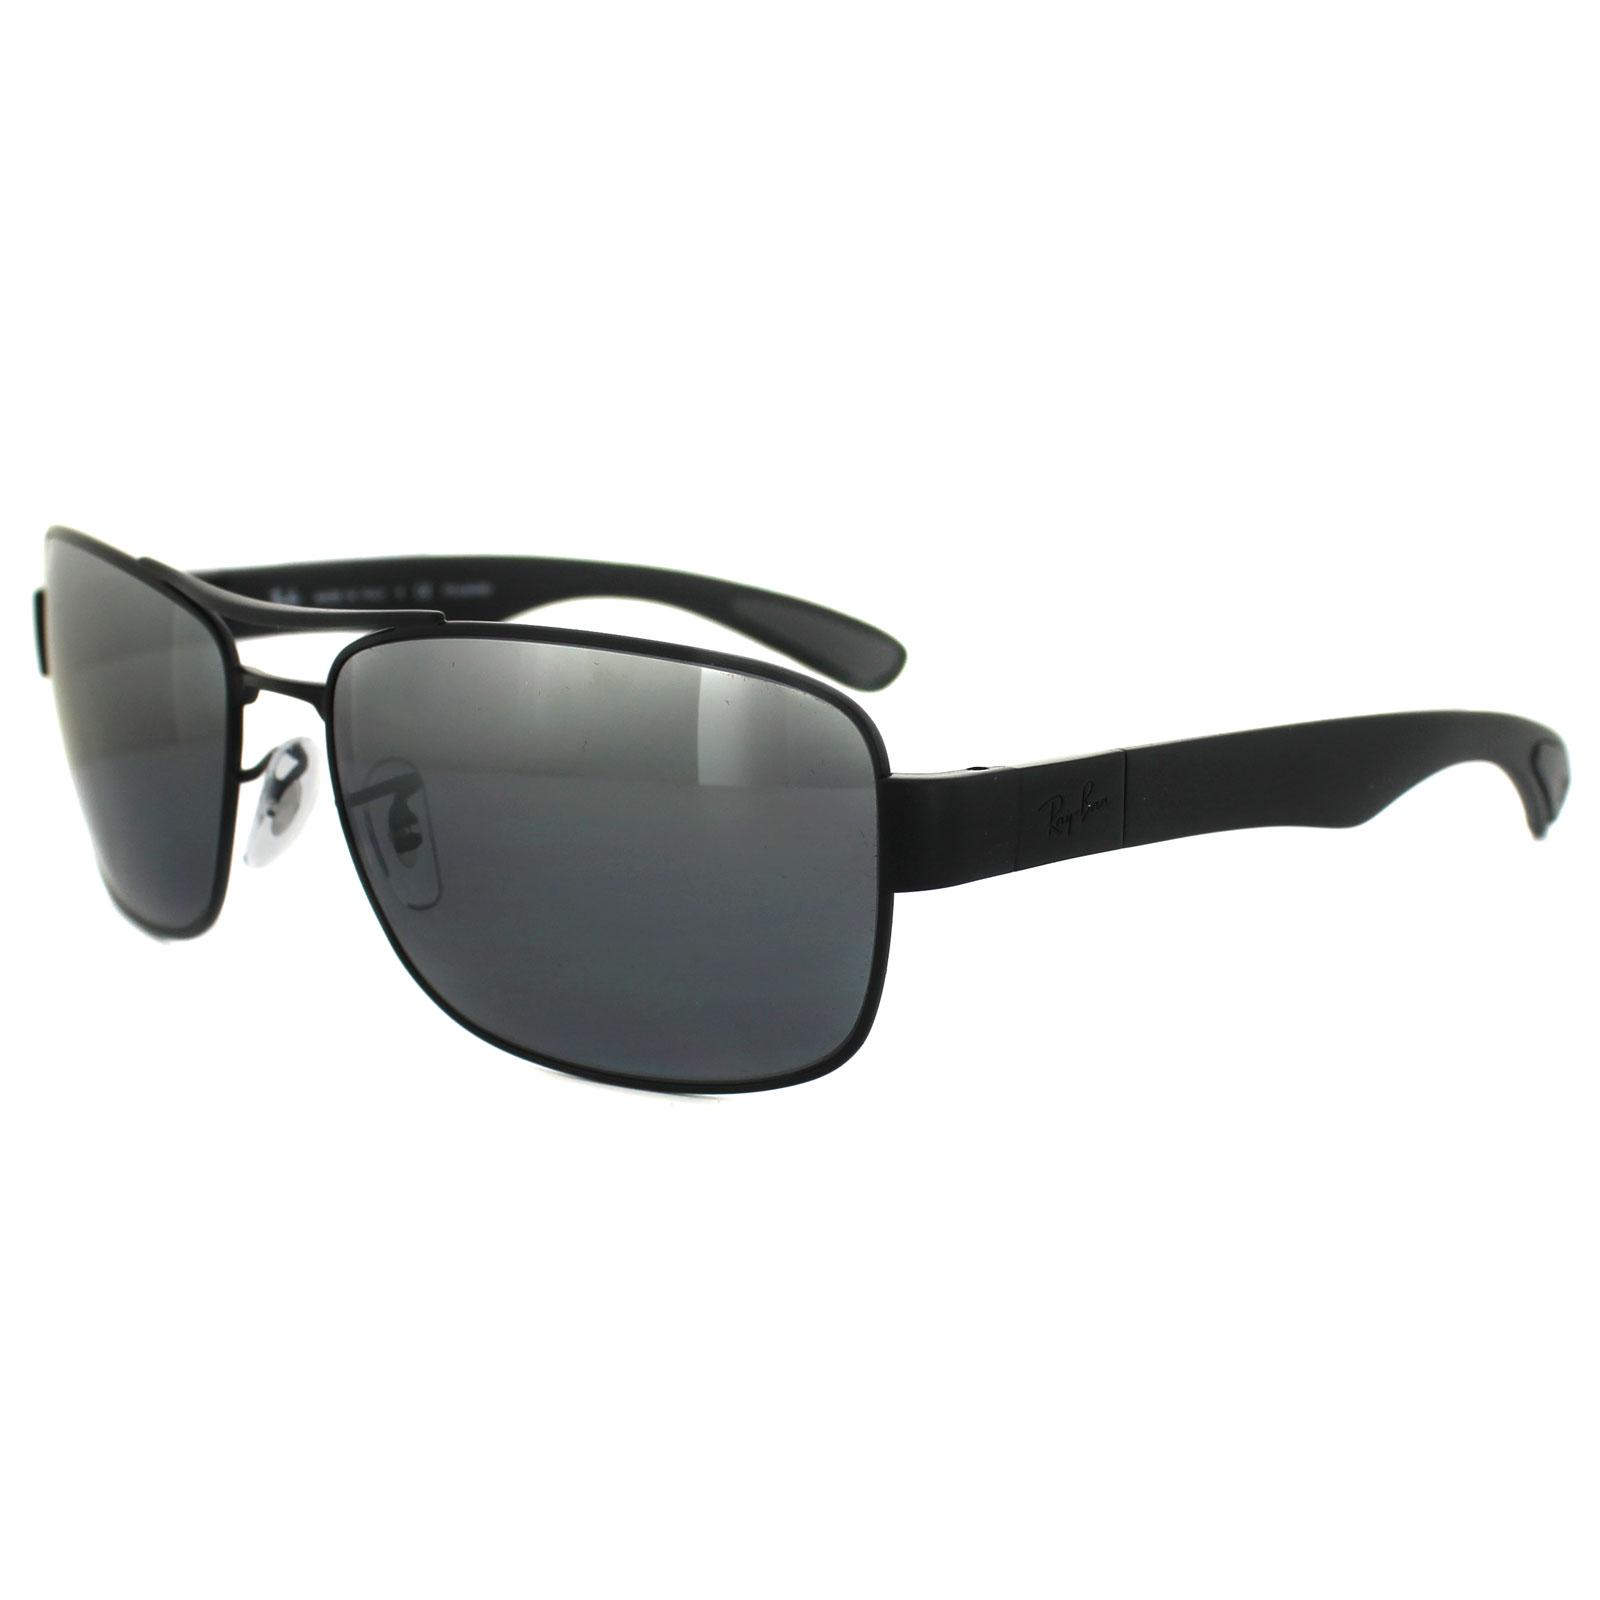 1d3ffbdb6c4 Sentinel Ray-Ban Sunglasses 3522 006 82 Black Silver Mirror Polarized